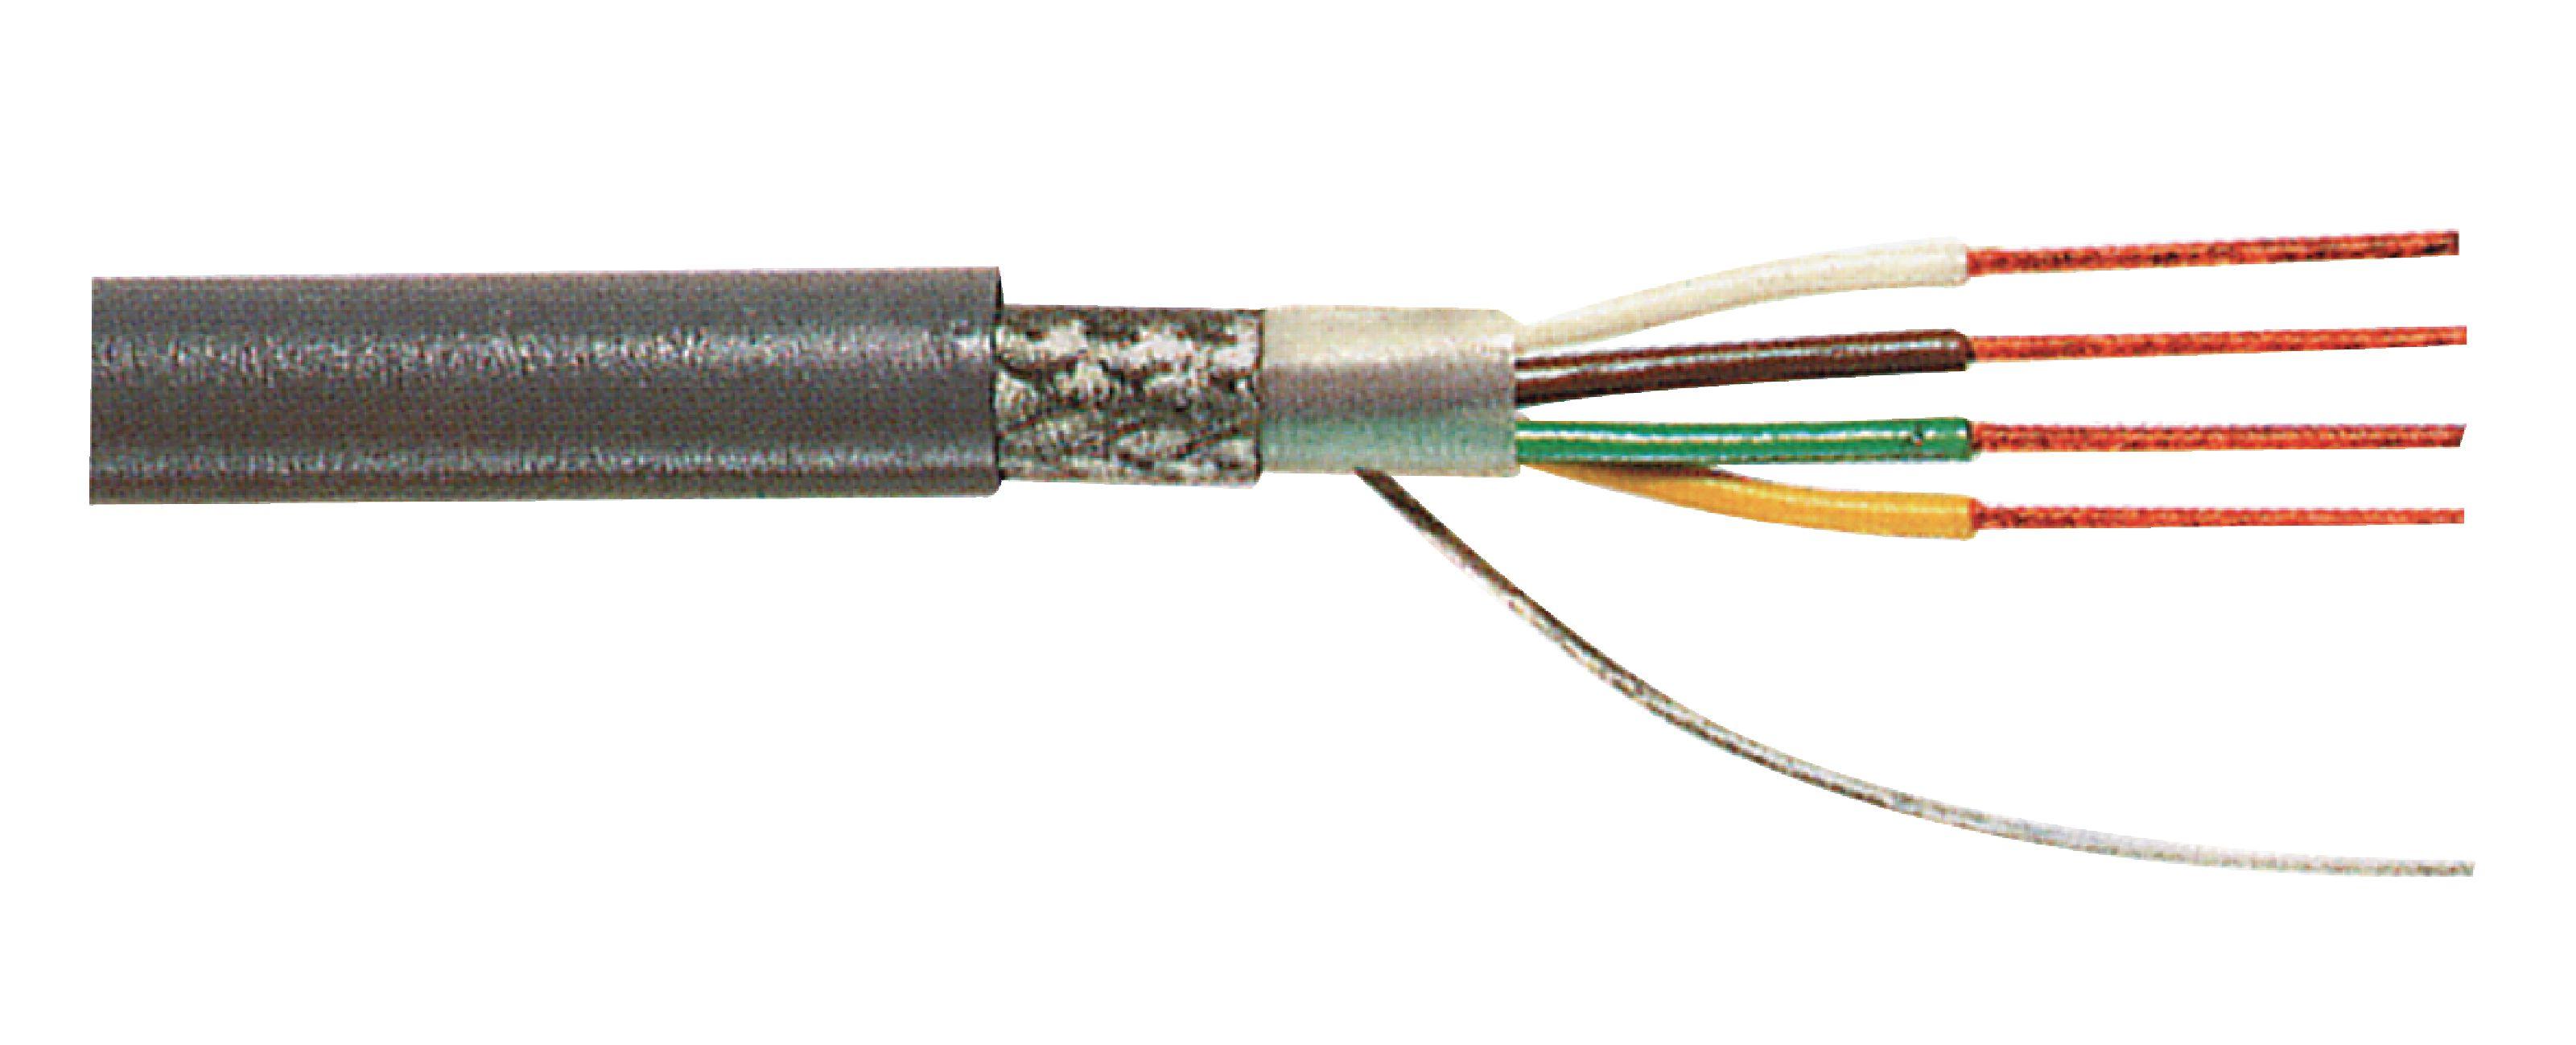 Cable de datos LIYCY 4 x 0,25 mm2 Tasker